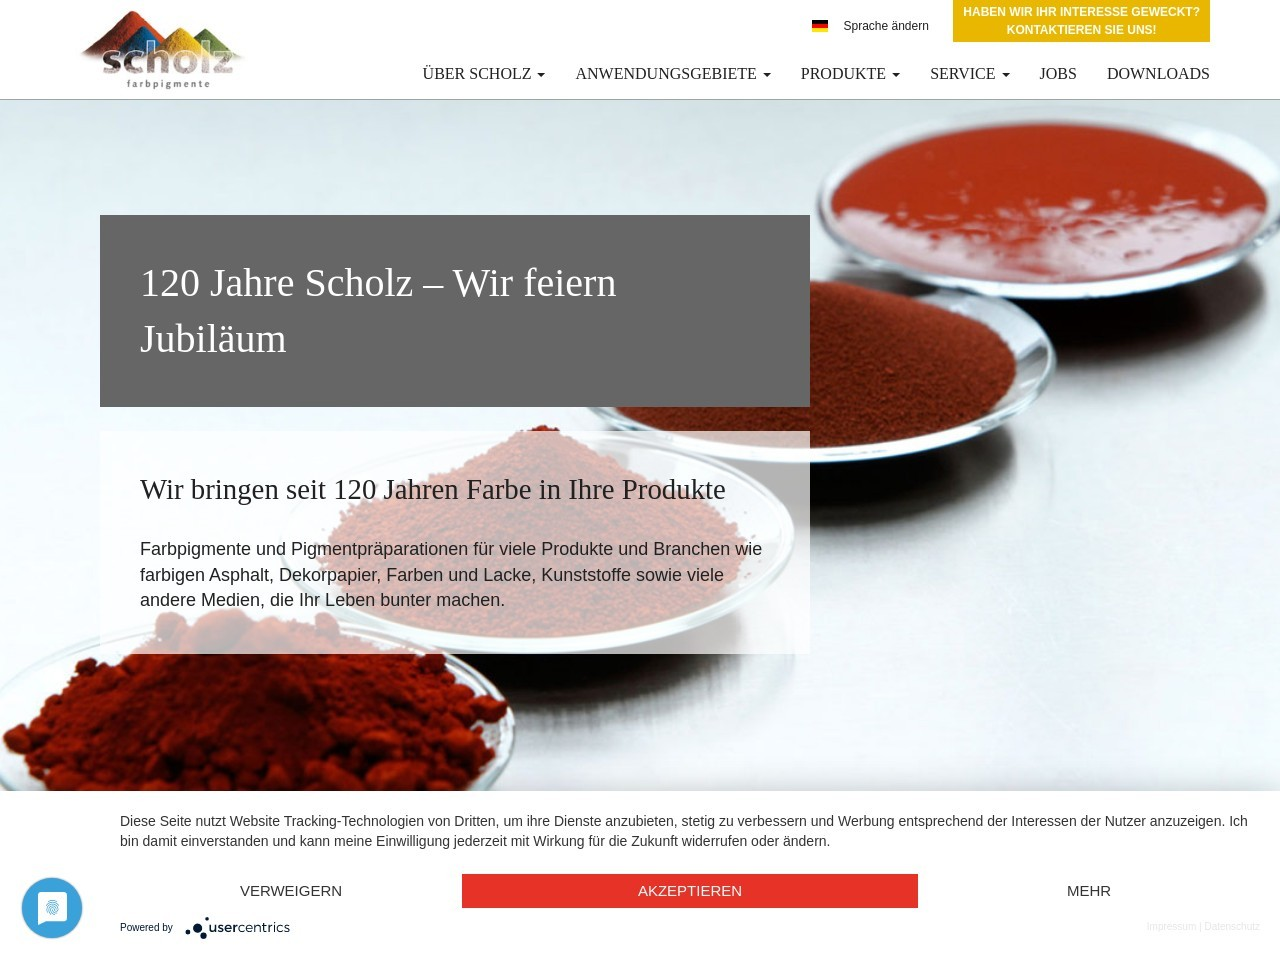 http://harold-scholz.de.nerdydata.com